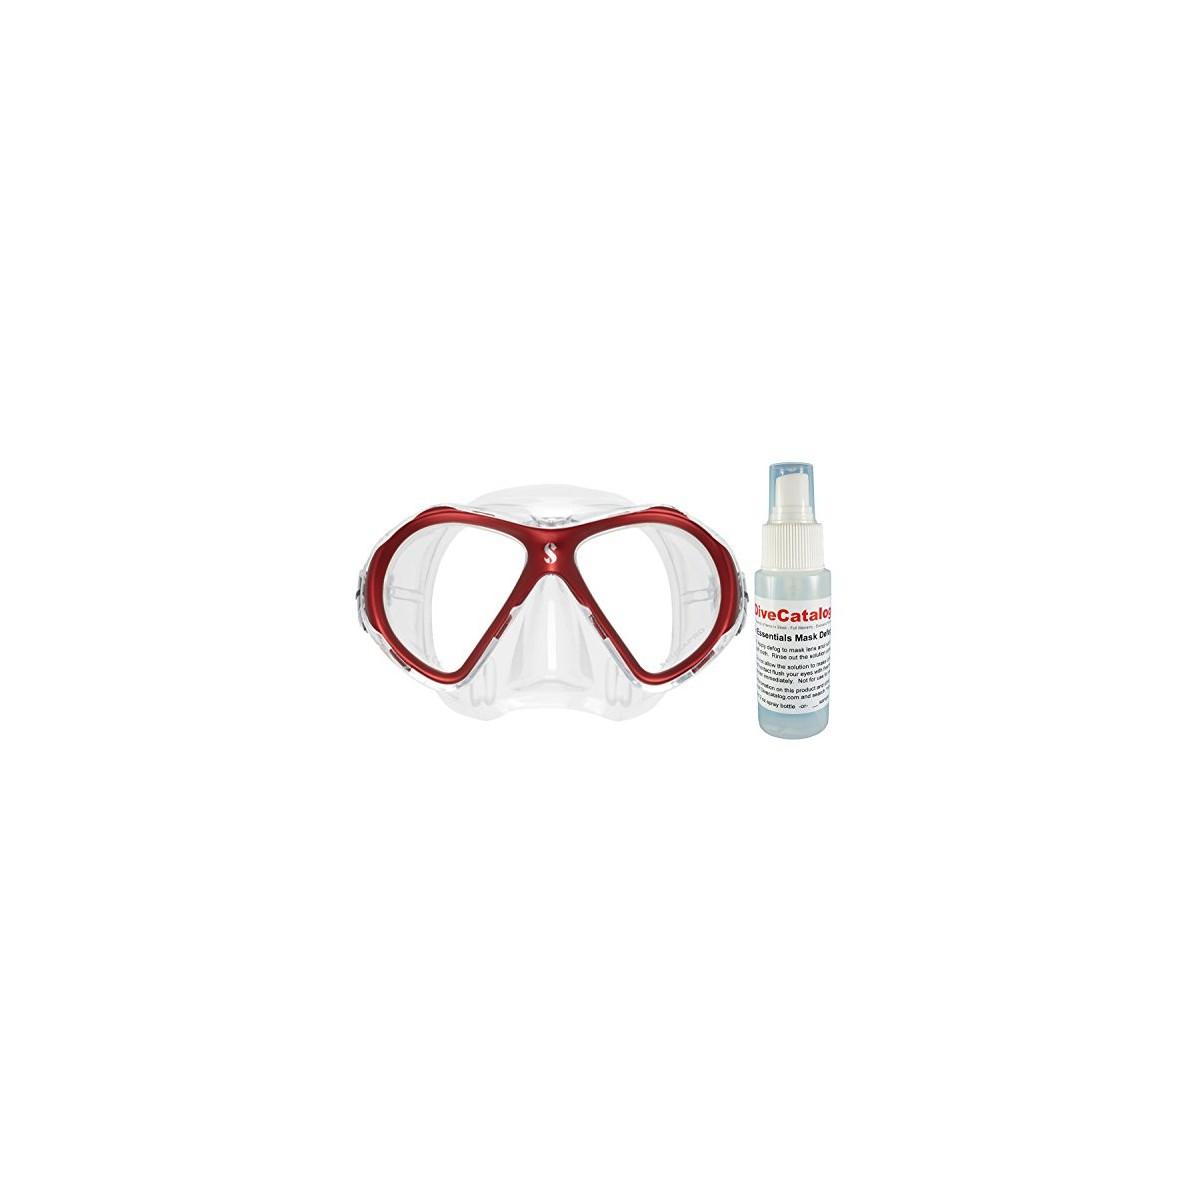 Scubapro Spectra Mini Dive Mask w/ 2oz Defog Spray